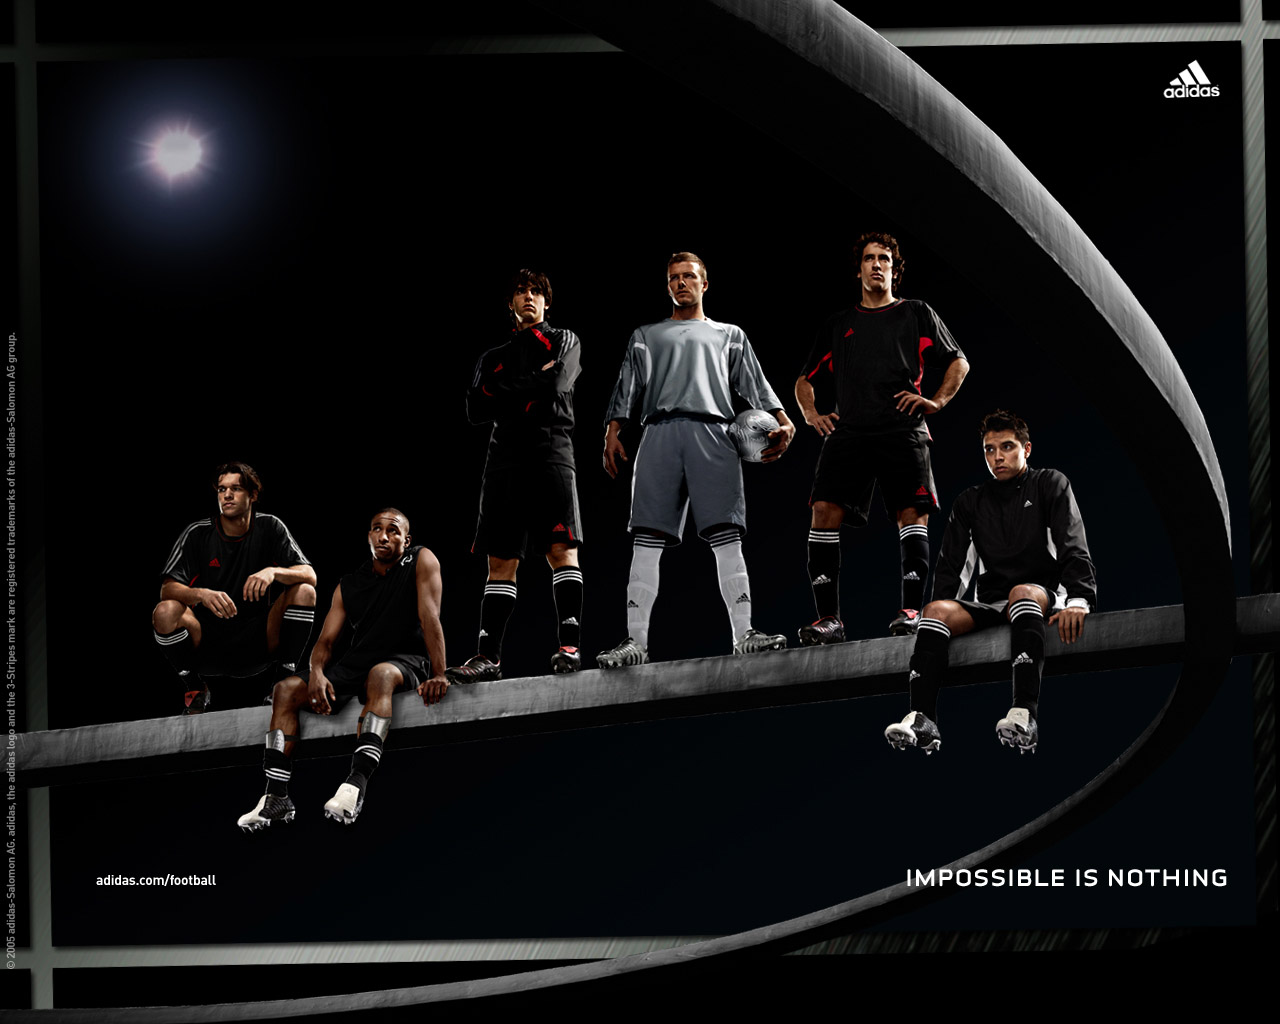 Nike Football Wallpaper 10160 Hd Wallpapers in Football   Imagescicom 1280x1024